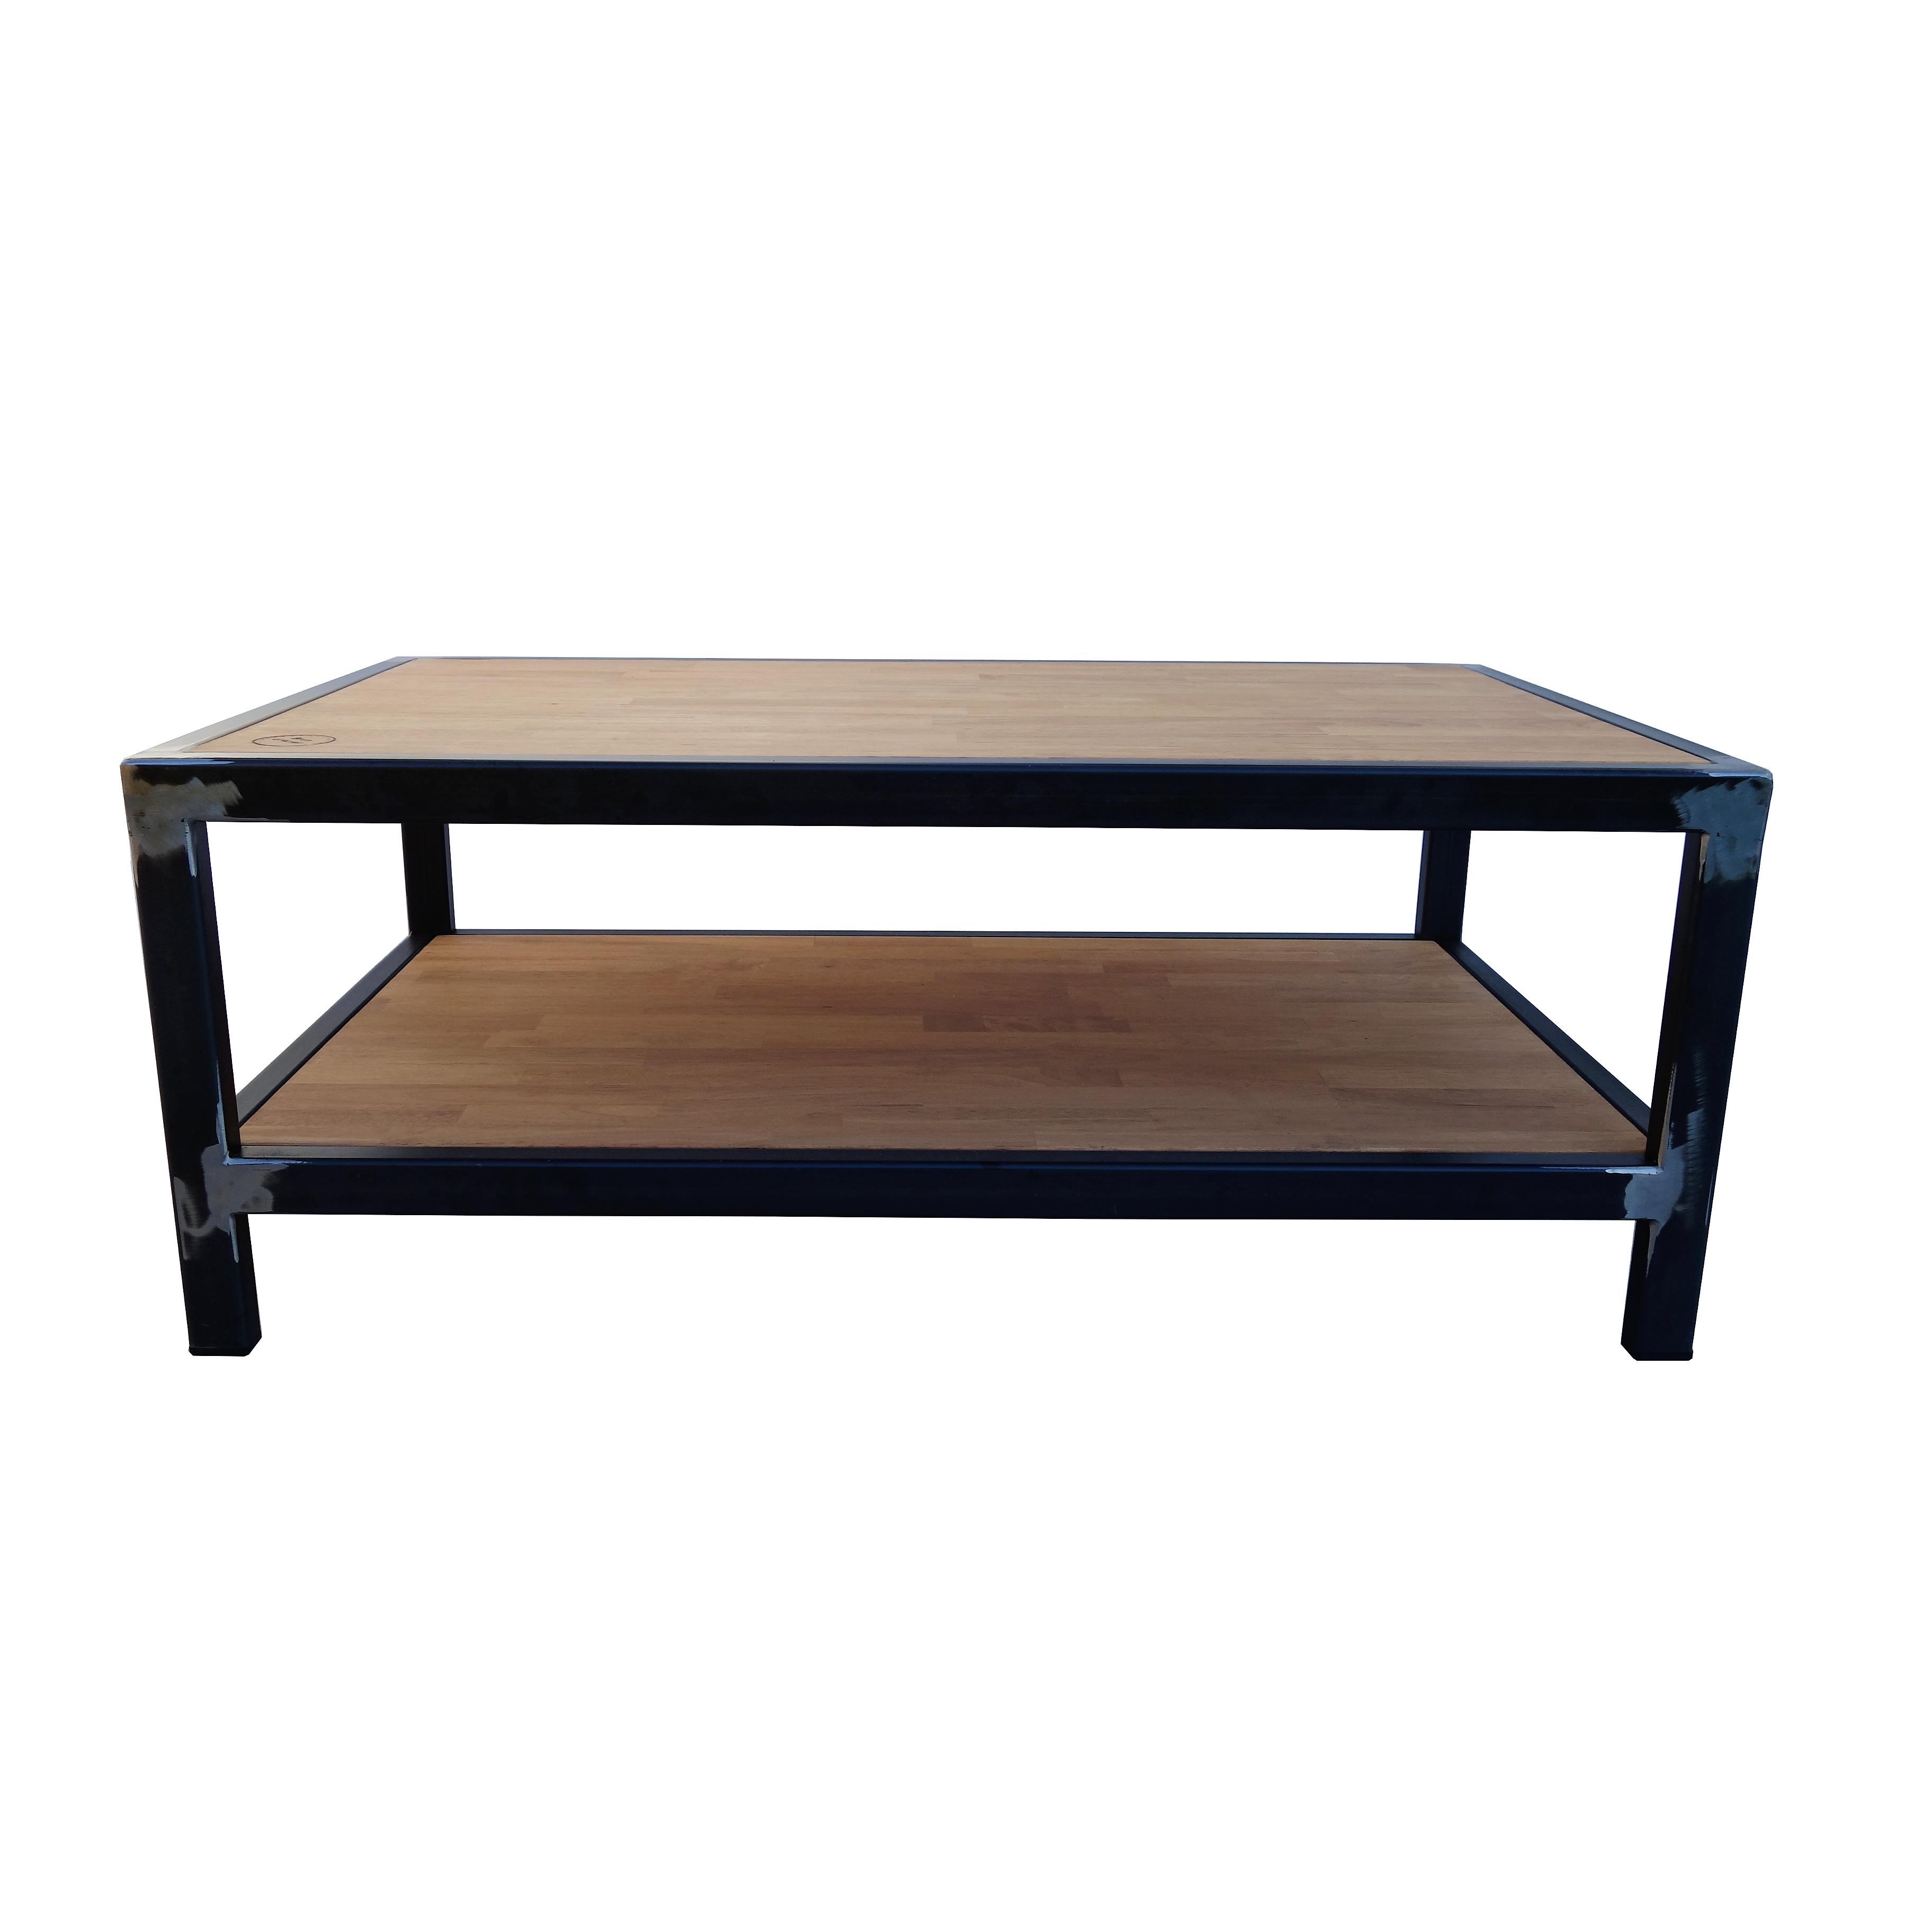 table basse london deux plateaux. Black Bedroom Furniture Sets. Home Design Ideas